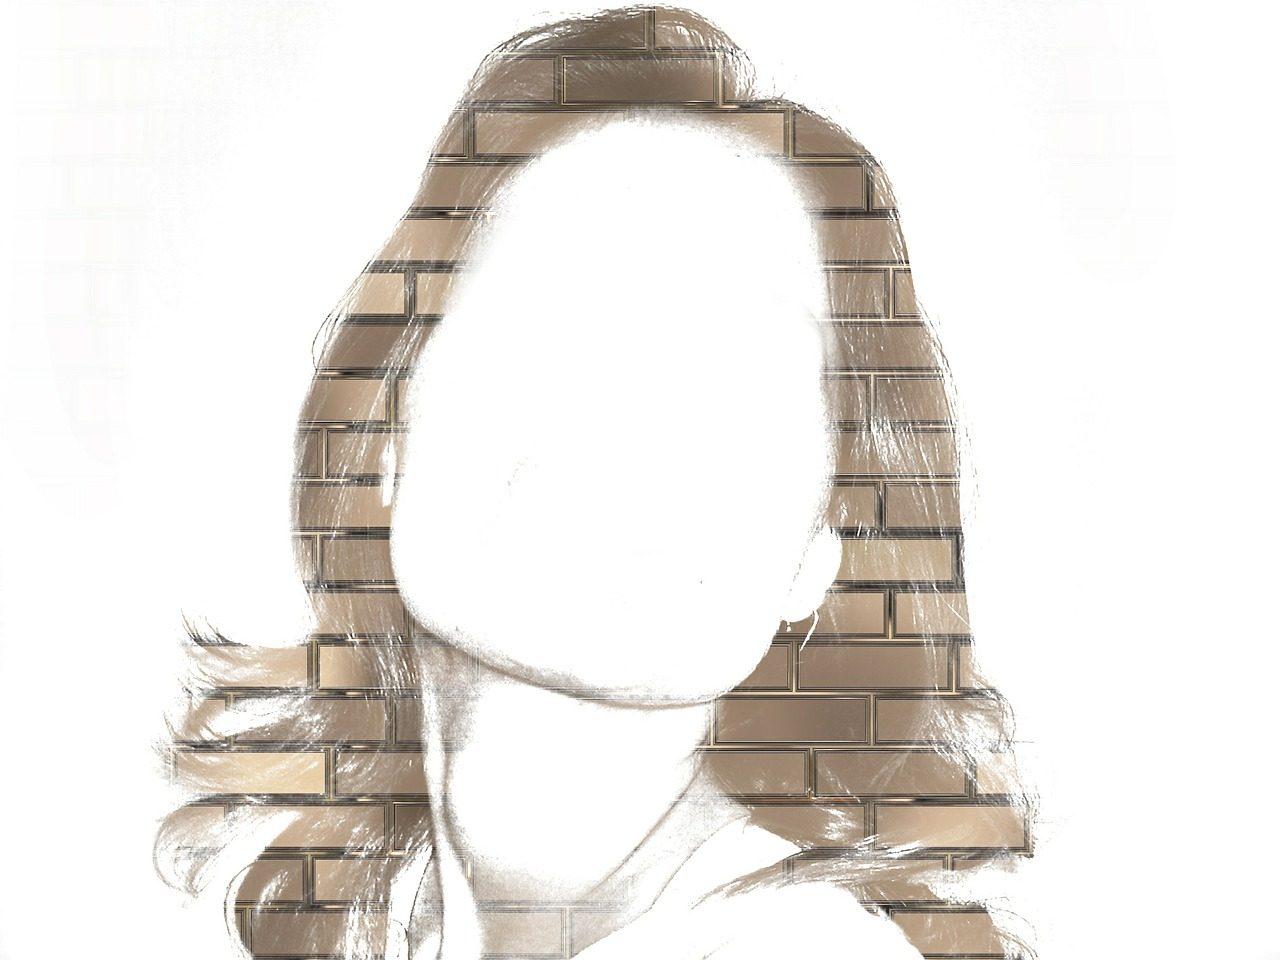 woman-533626_1280-1280x960.jpg